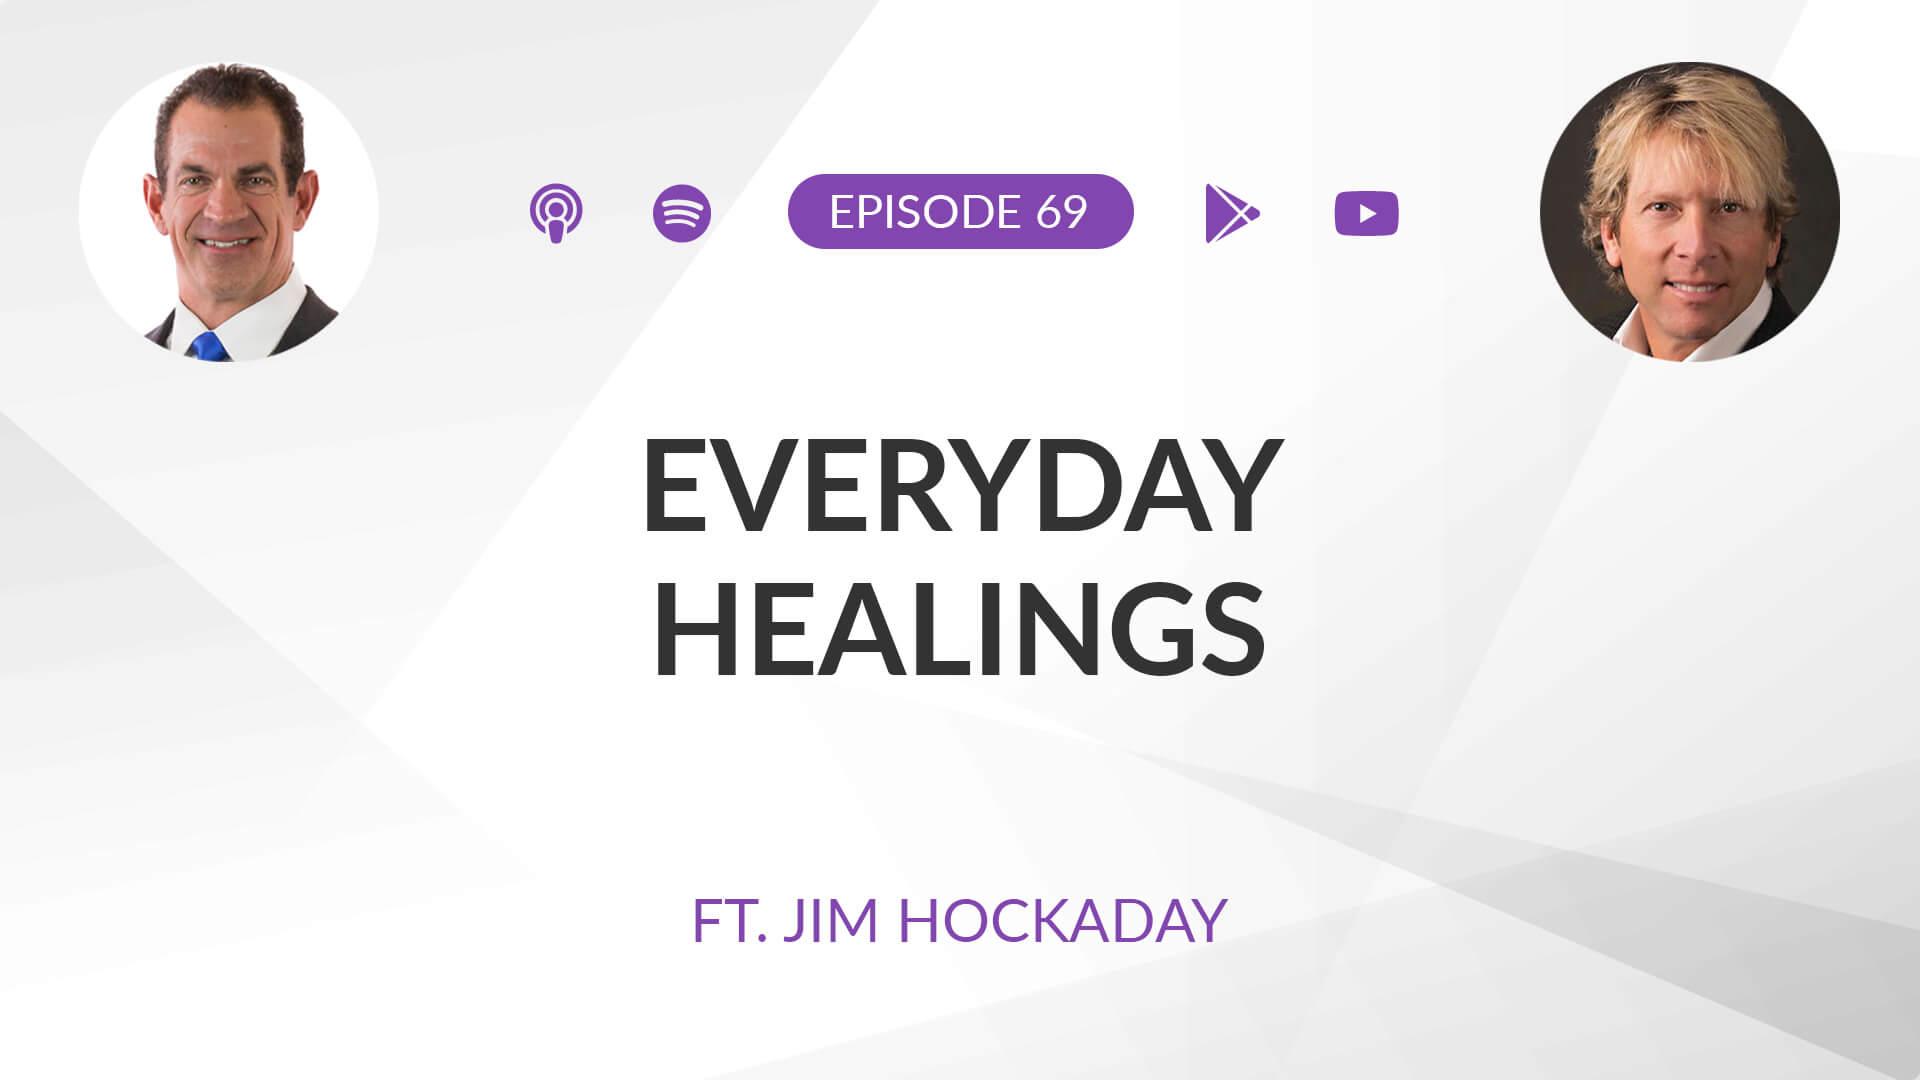 Ep 69: Everyday Healings ft. Jim Hockaday